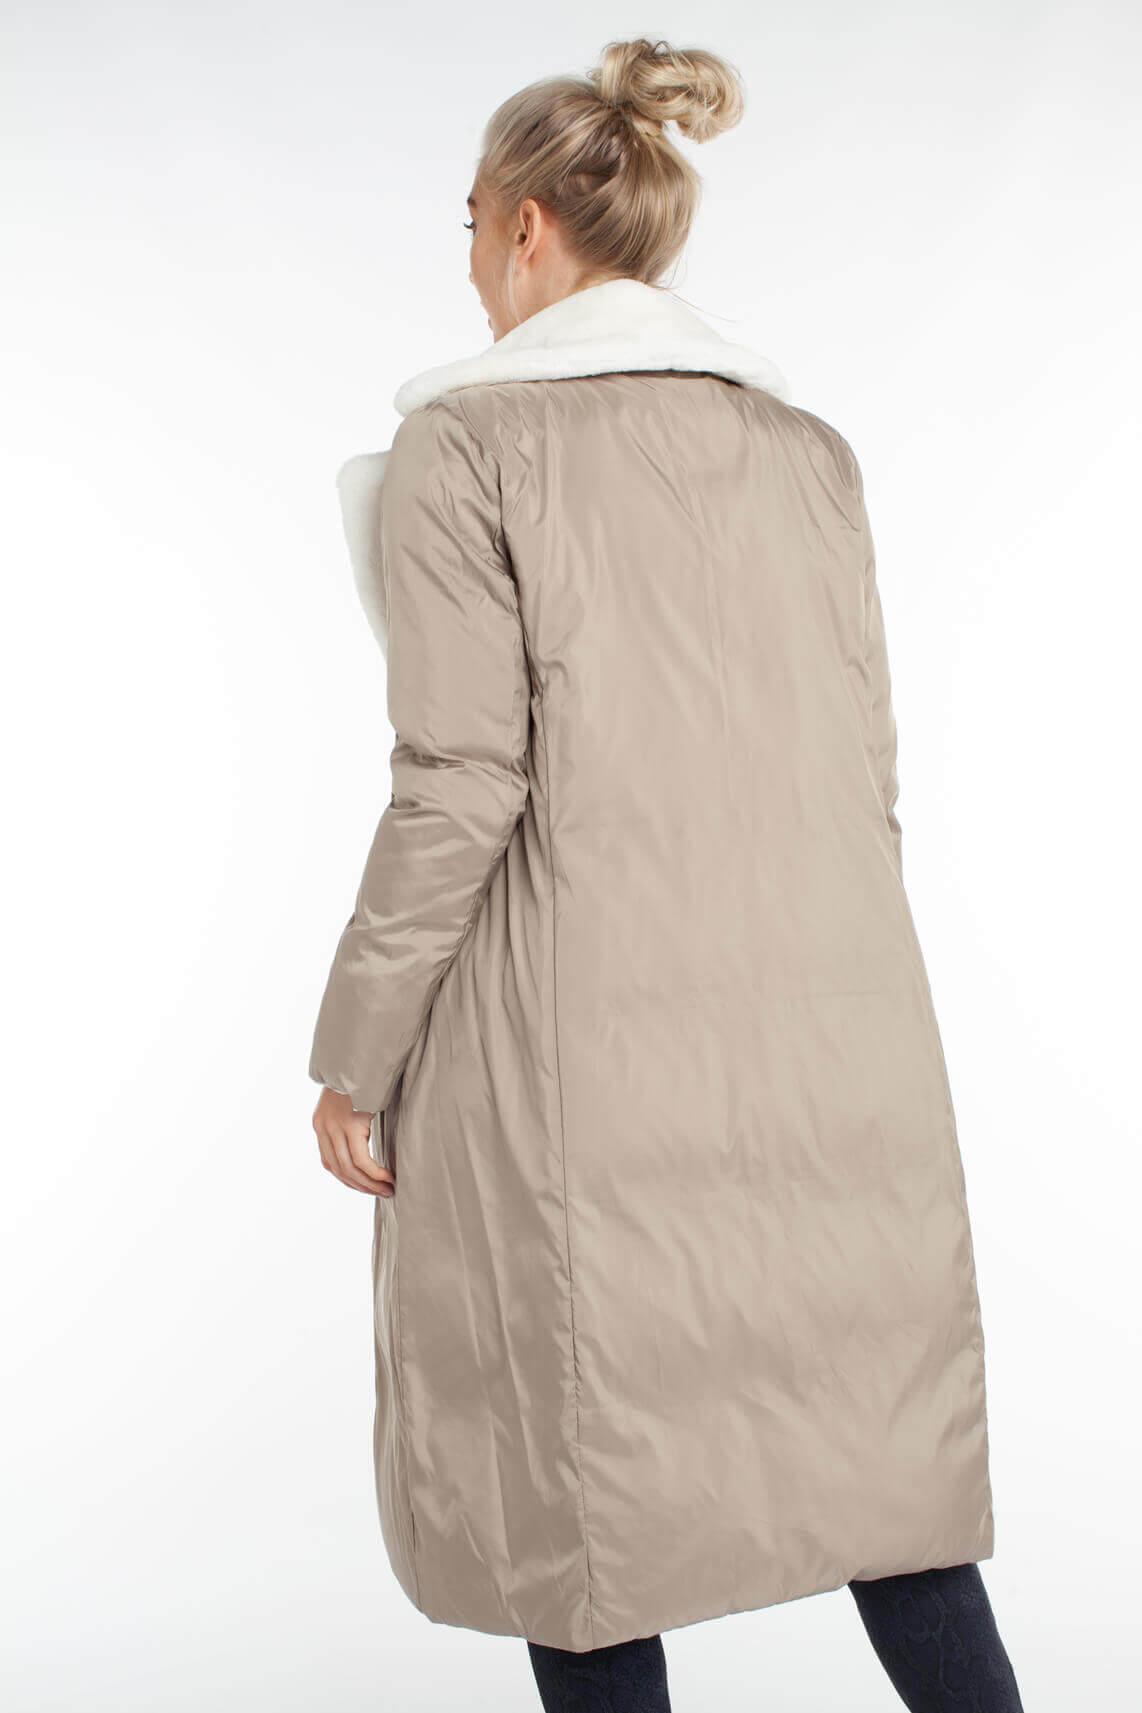 Beaumont Dames Reversibele donsjas met fake fur kraag Bruin